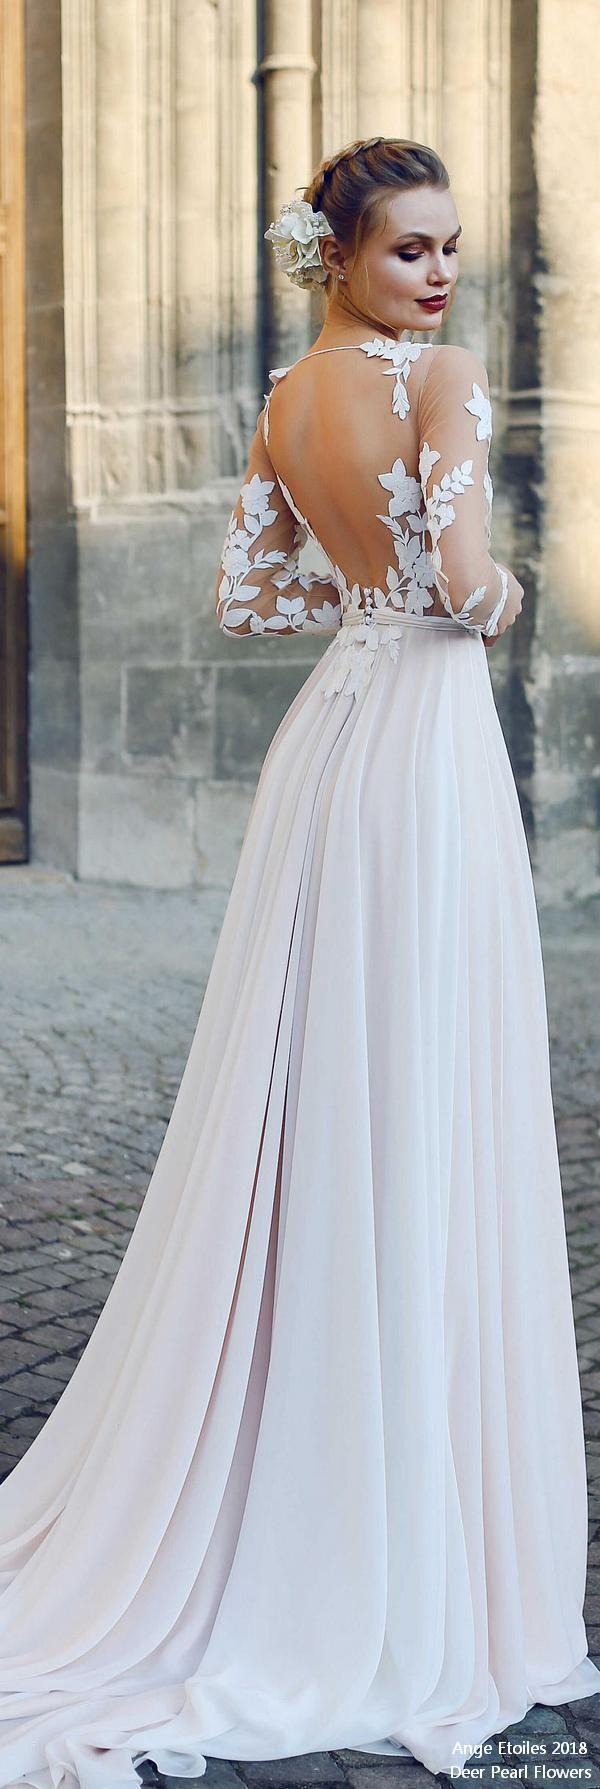 Etsy Finds Ange Etoiles Wedding Dresses Vintage weddings